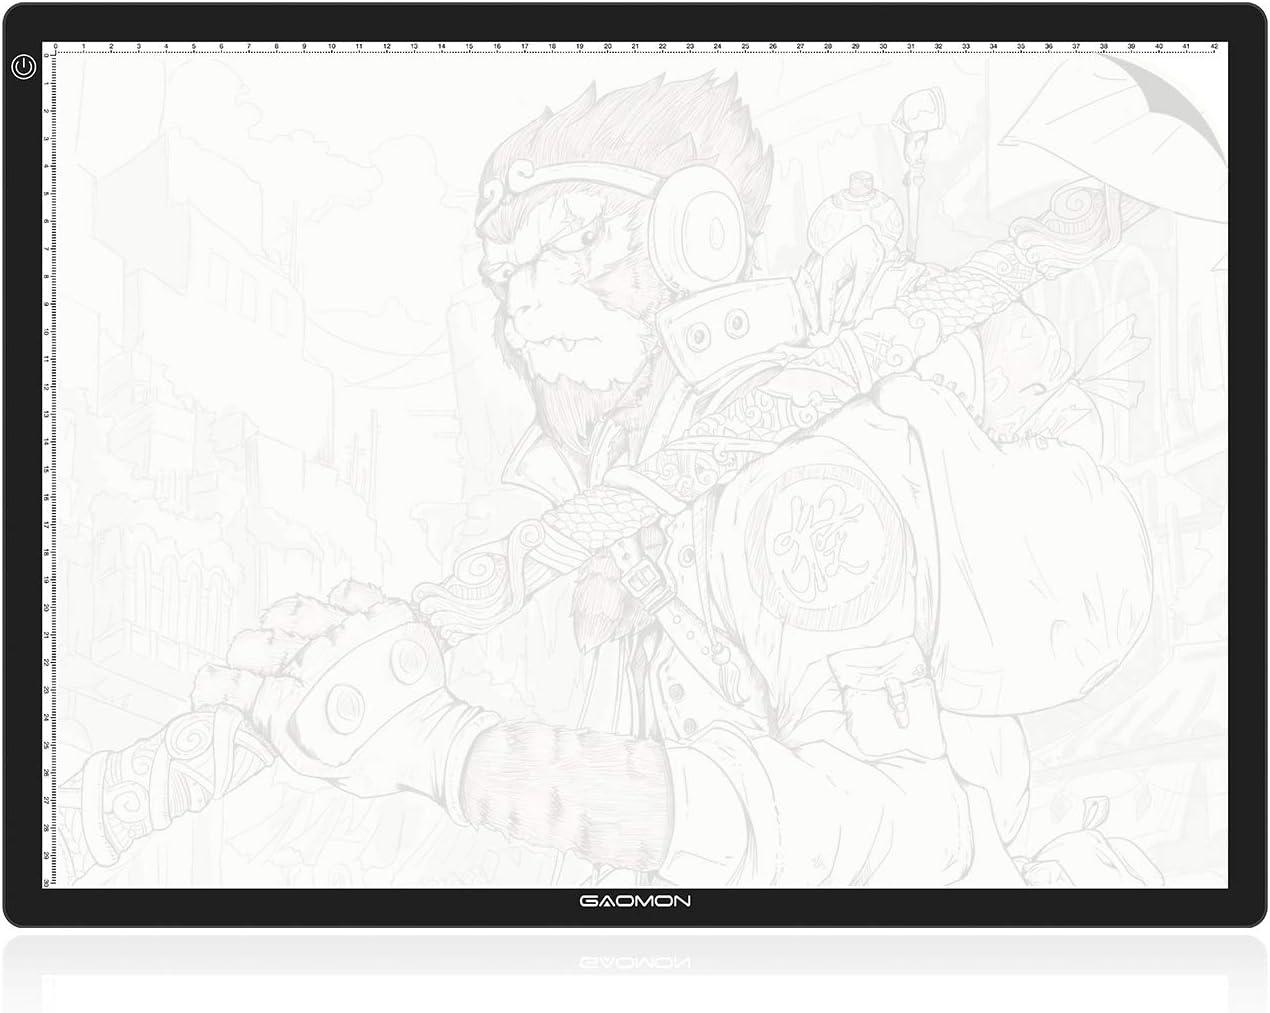 GAOMON GA3 Mesa de Luz Ultrafina Tableta de Luz de Dibujo con Placa de Escala para Pintura de Diamante Boceto Animación Tatuaje de Rayos X